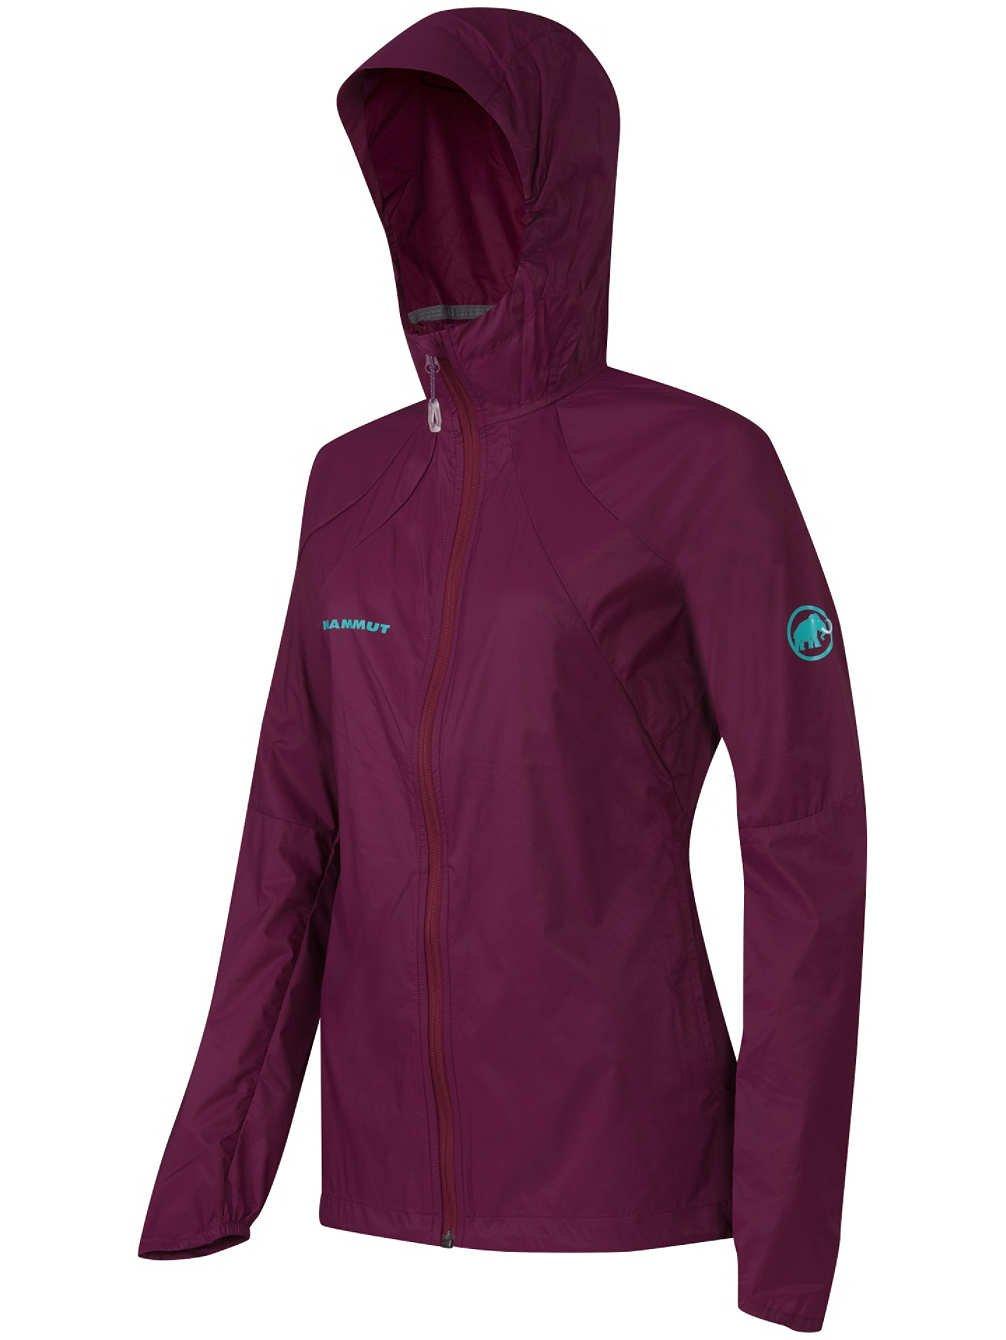 Mammut Runbold WB Hooded Jacket Women (Softshell Jackets/Vests)